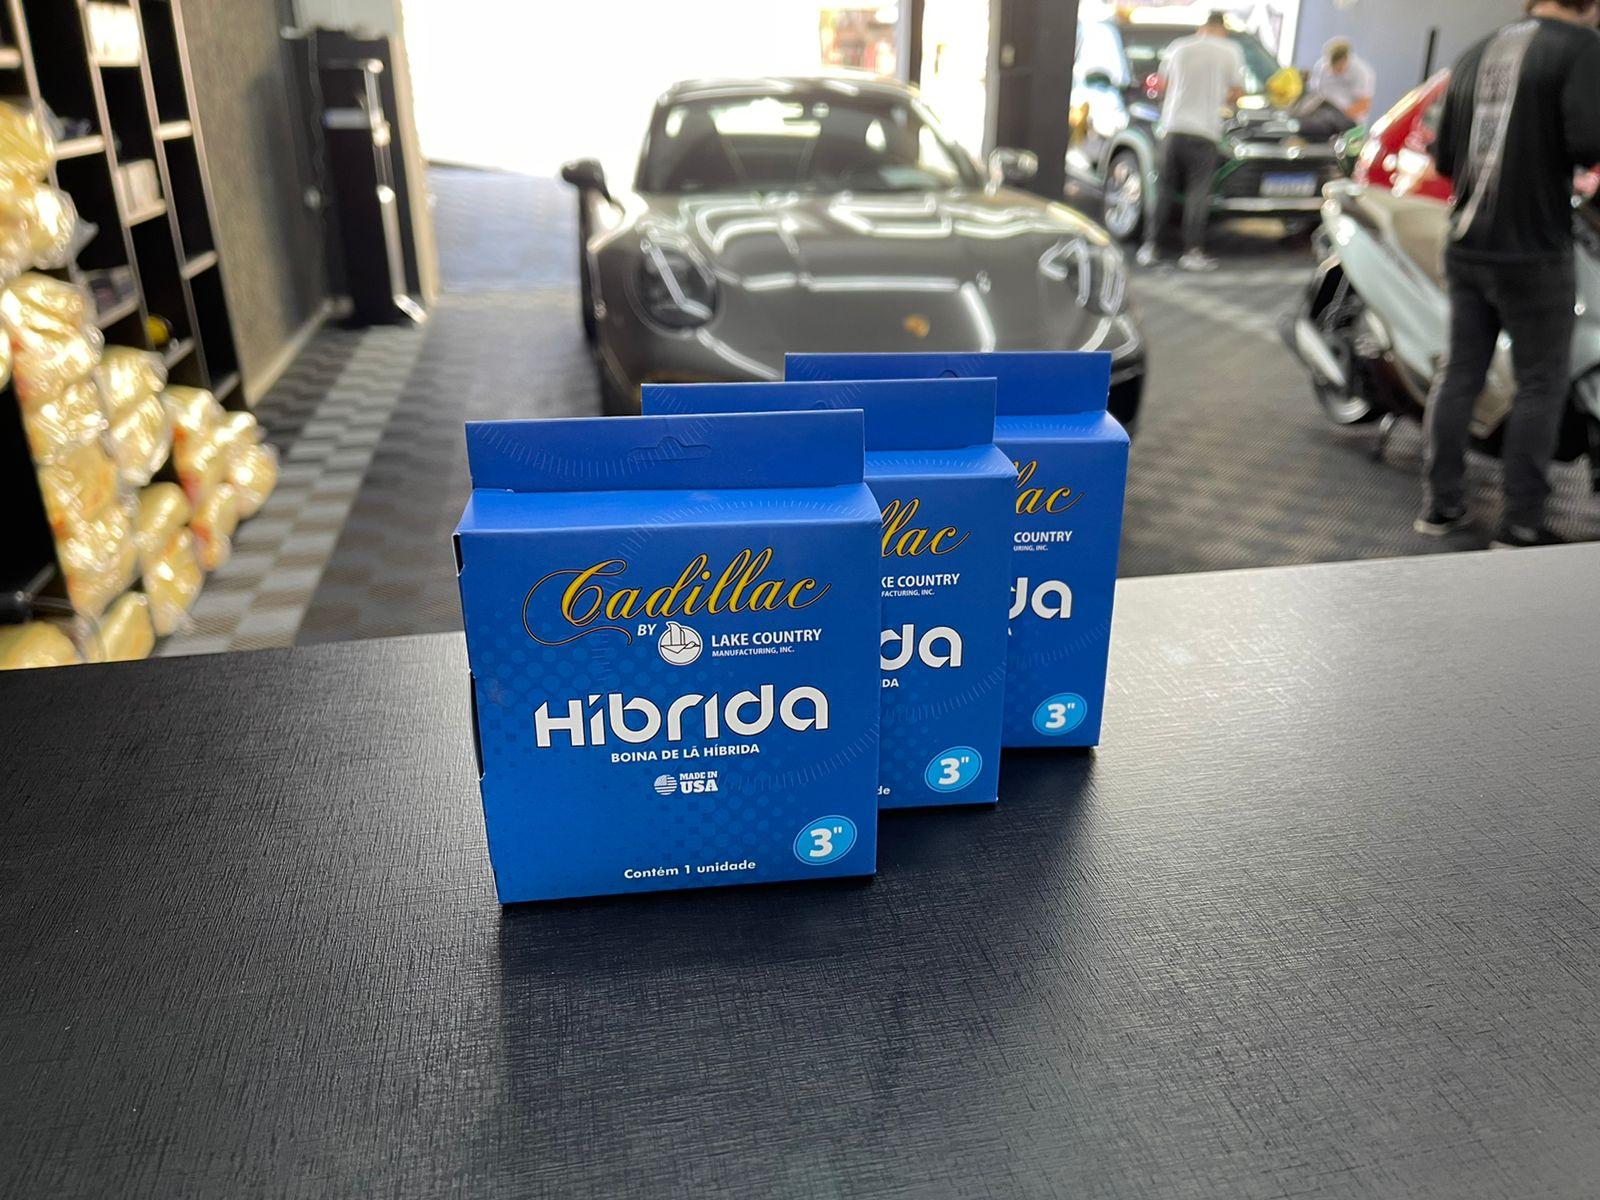 "Boina de lã híbrida azul 3"" Cadillac"